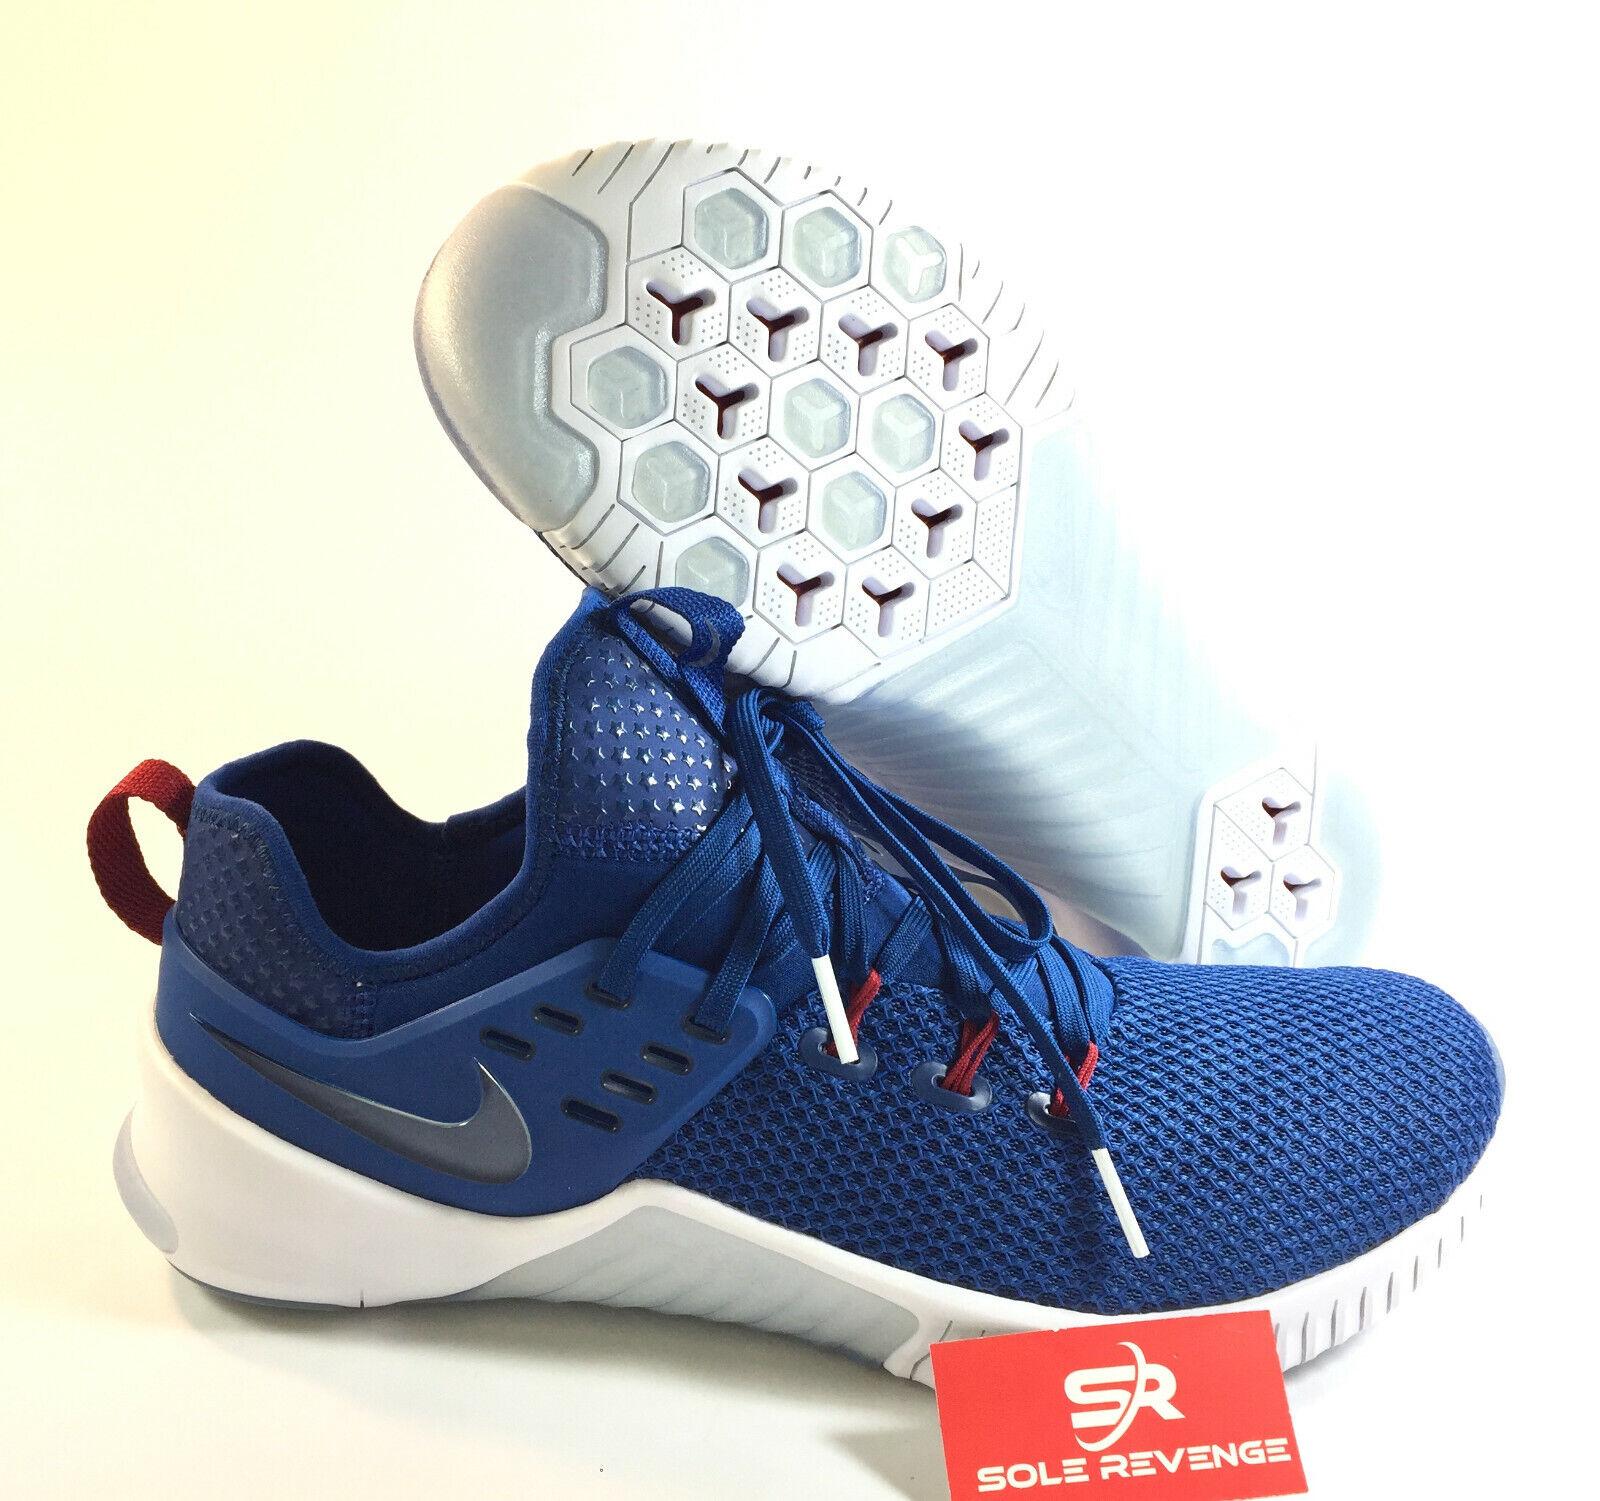 NIKE FREE X METCON - MEN'S A0630-441 AMERICANA Gym bluee White Team Red  c1